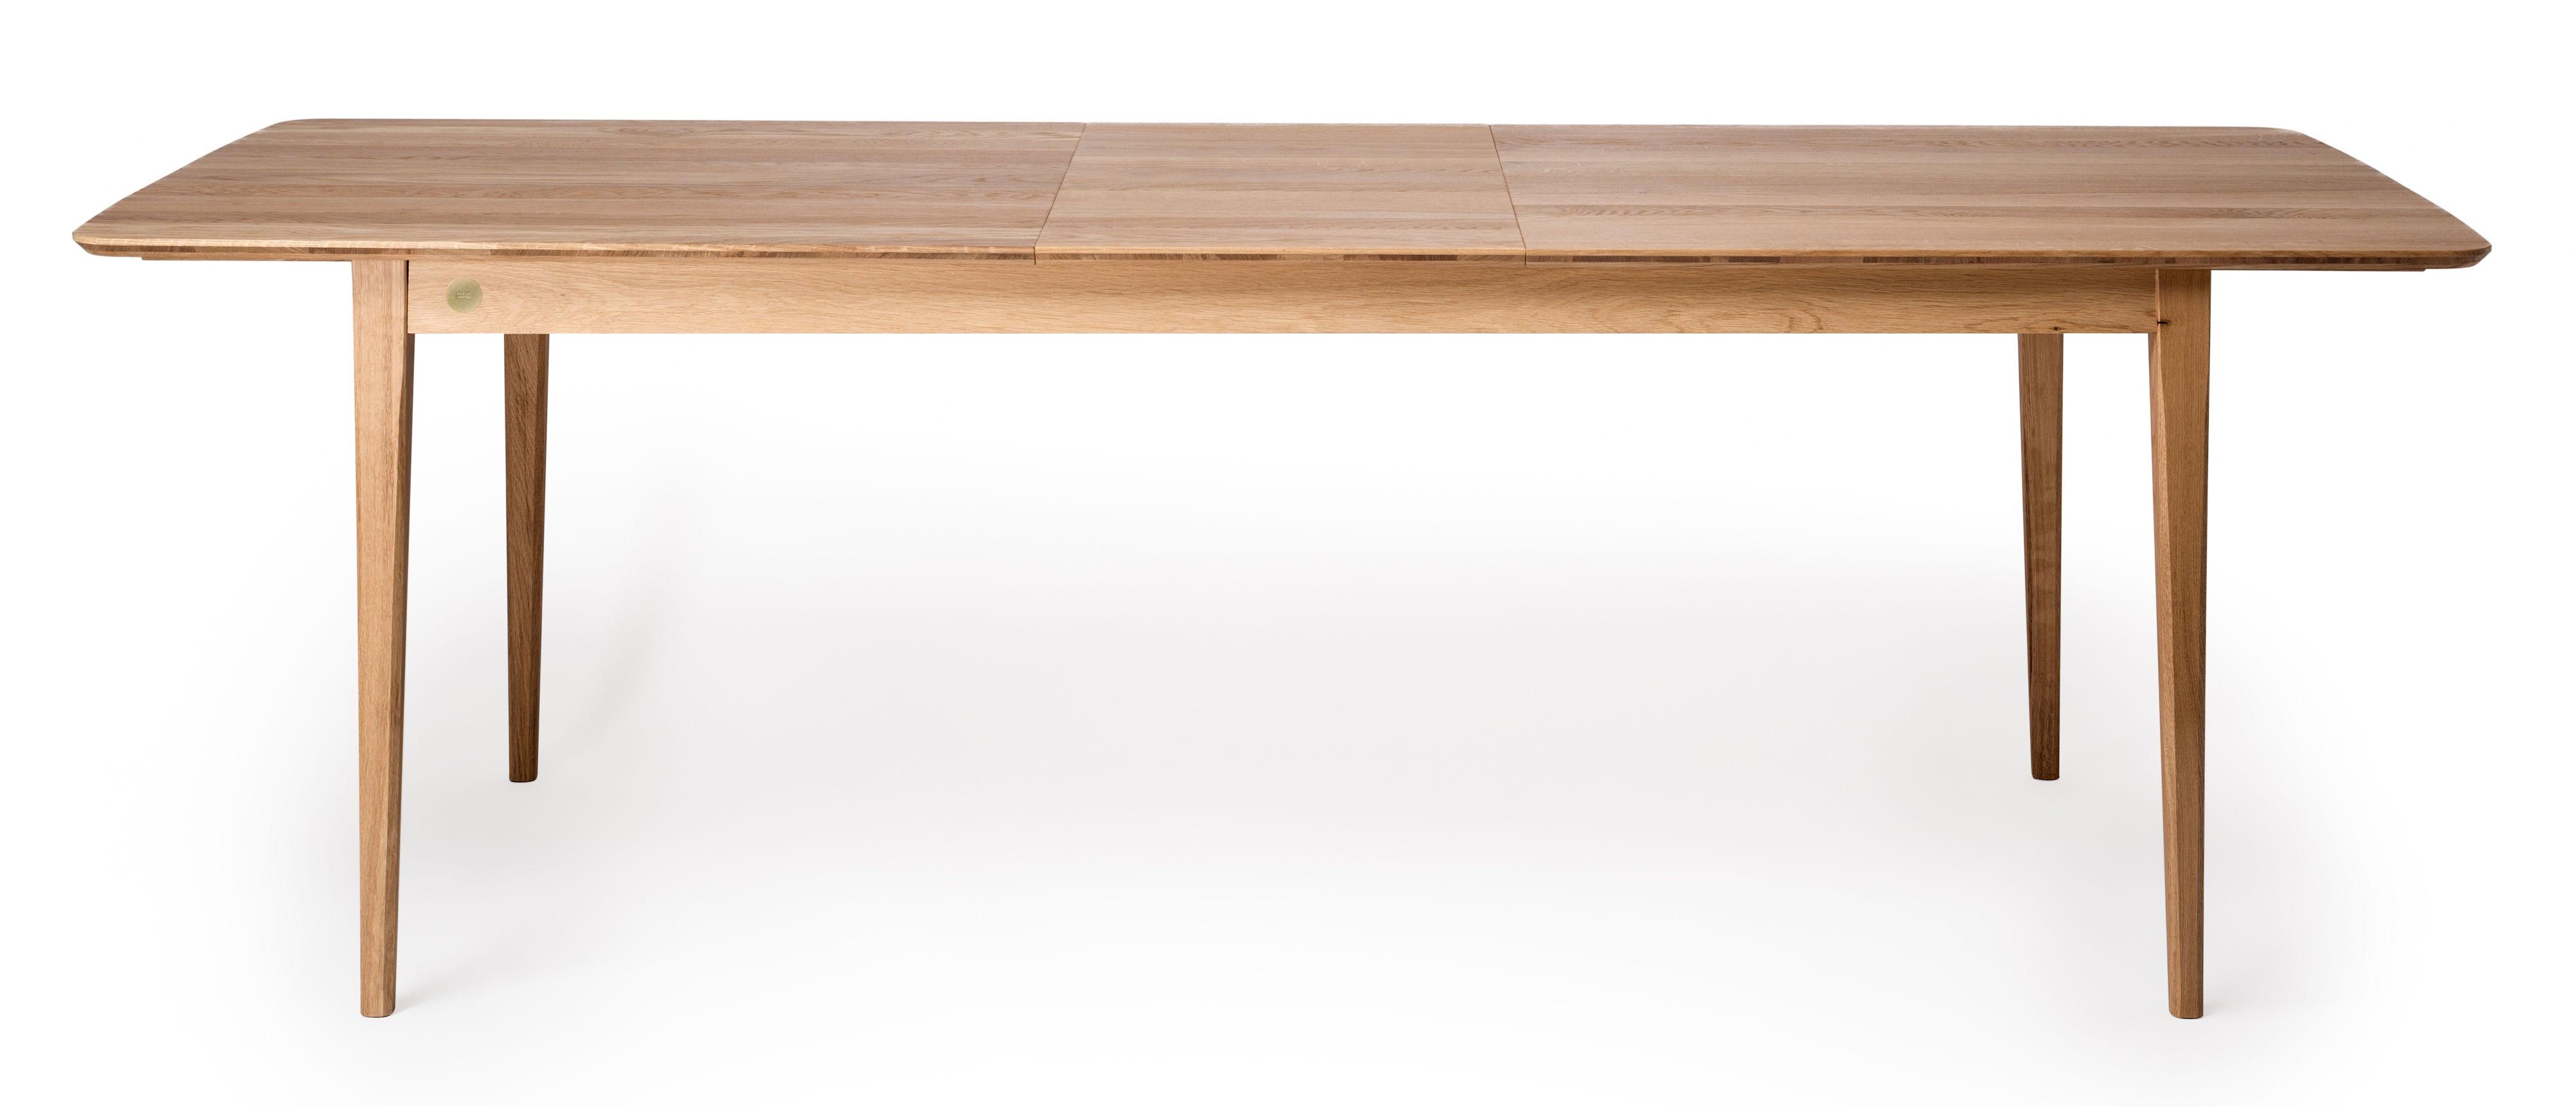 Table rallonge market l 180 270 cm ch ne ch ne - Petite table a rallonge ...